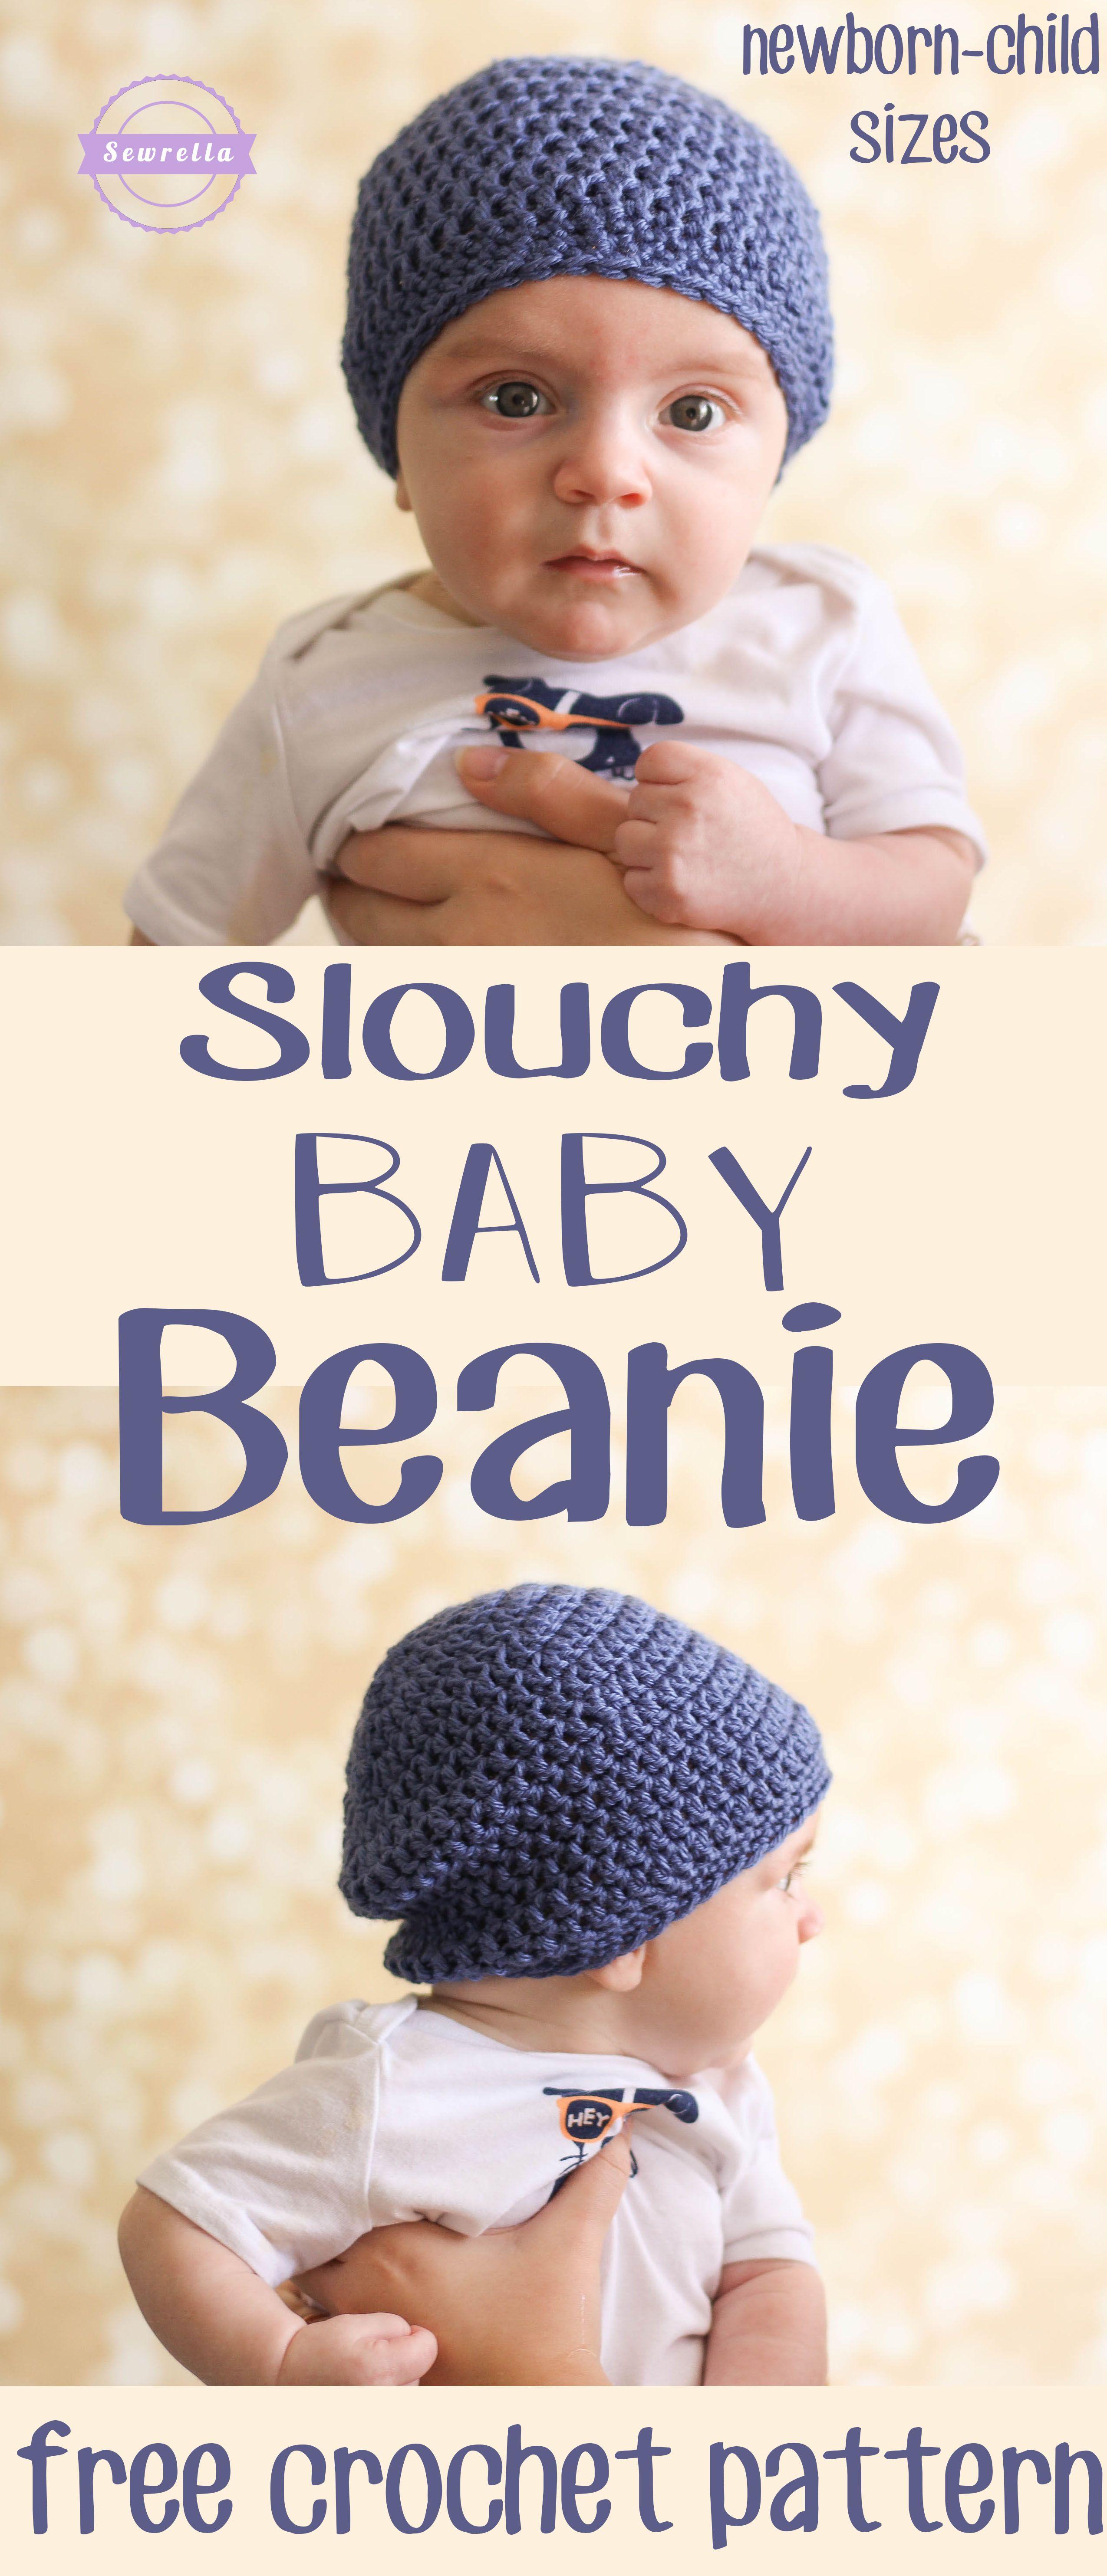 Crochet Slouchy Baby Beanie | Baby beanie hats, Free crochet and Crochet